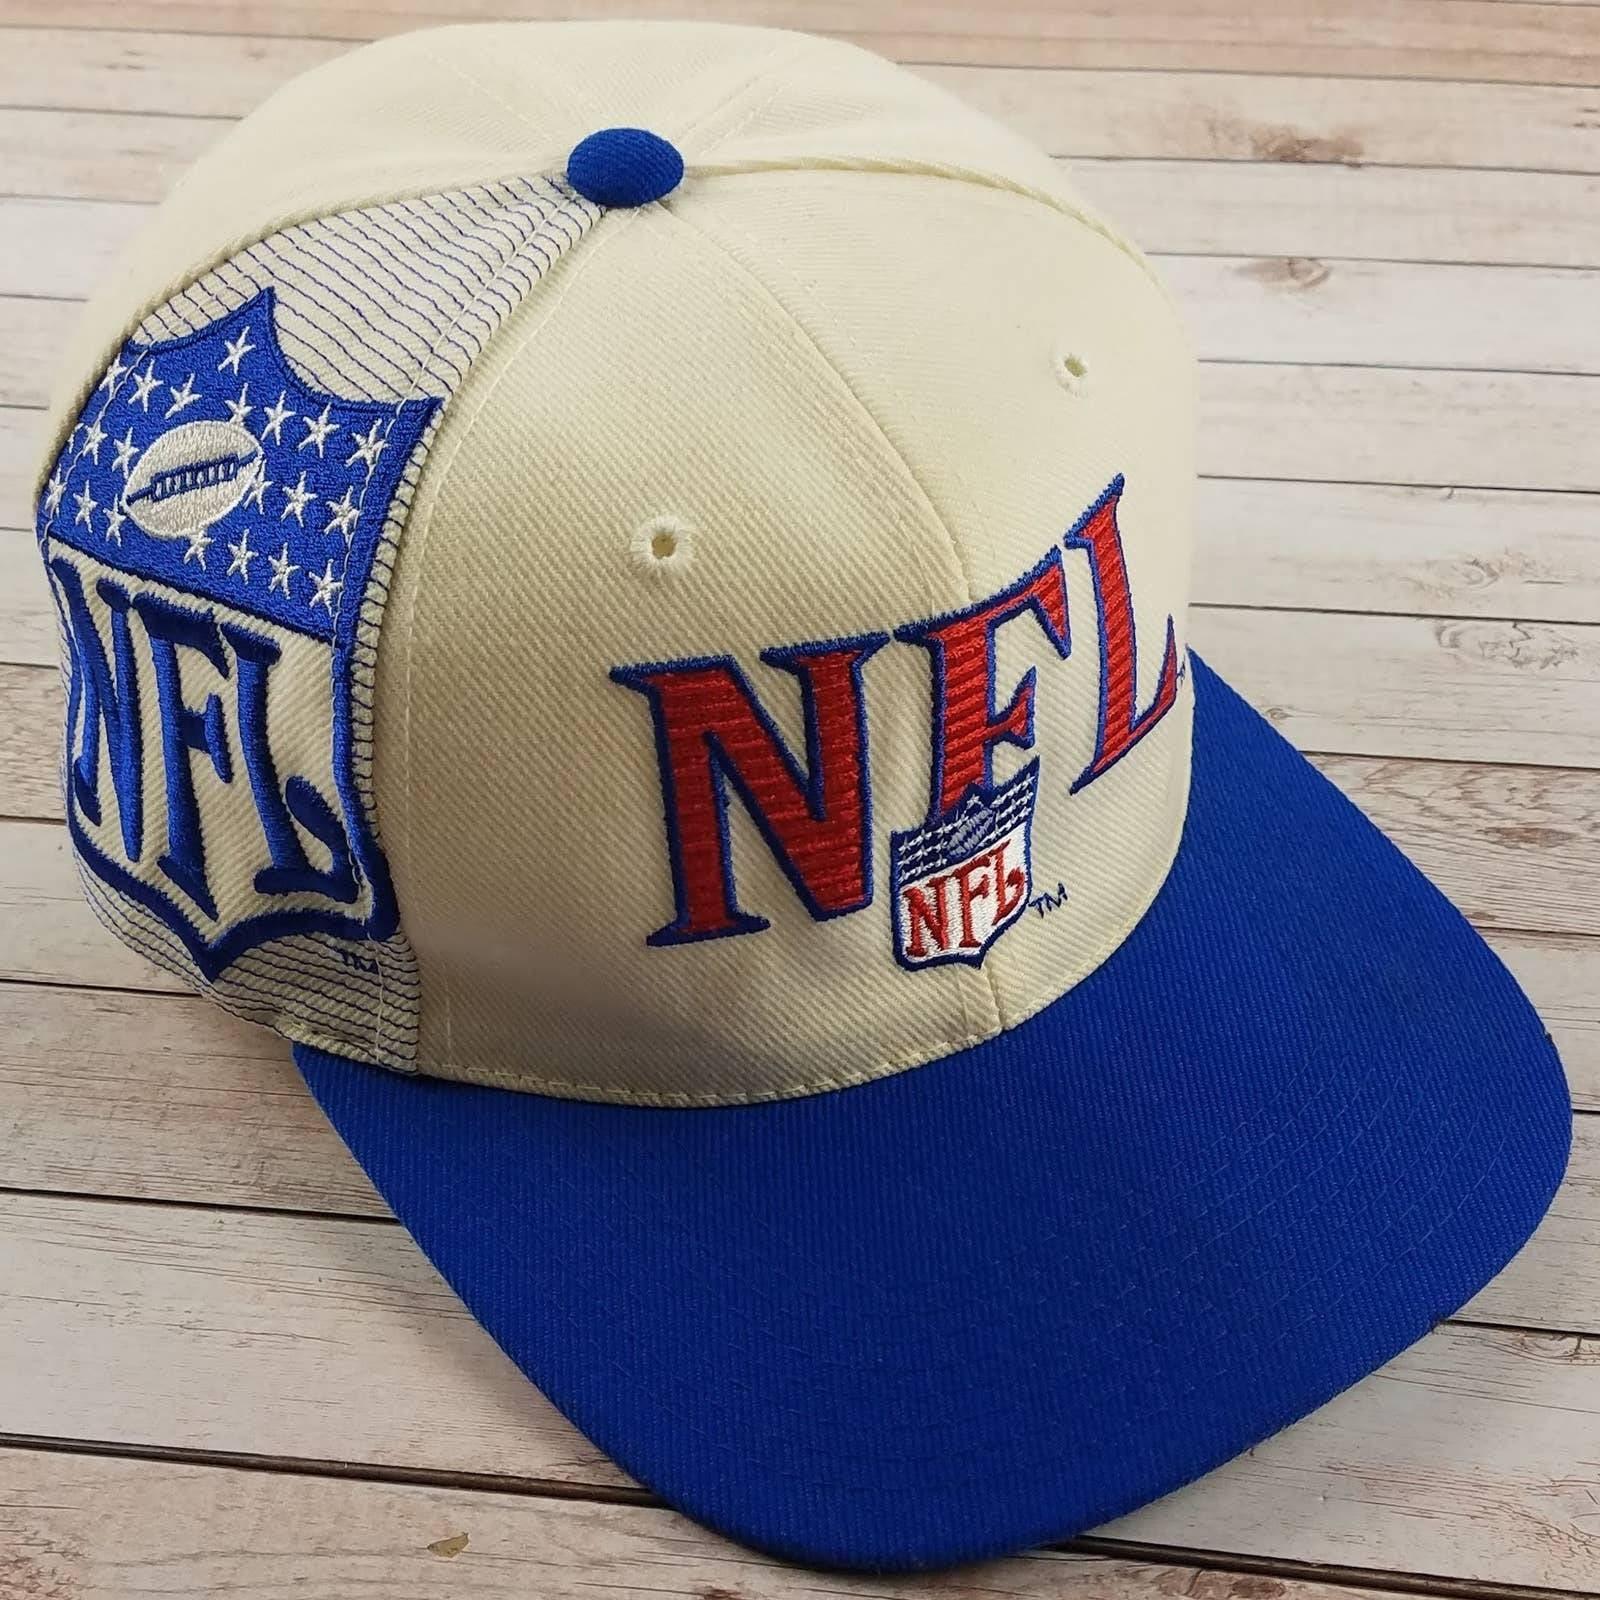 VTG 90s NFL Sports Specialties Laser Hat